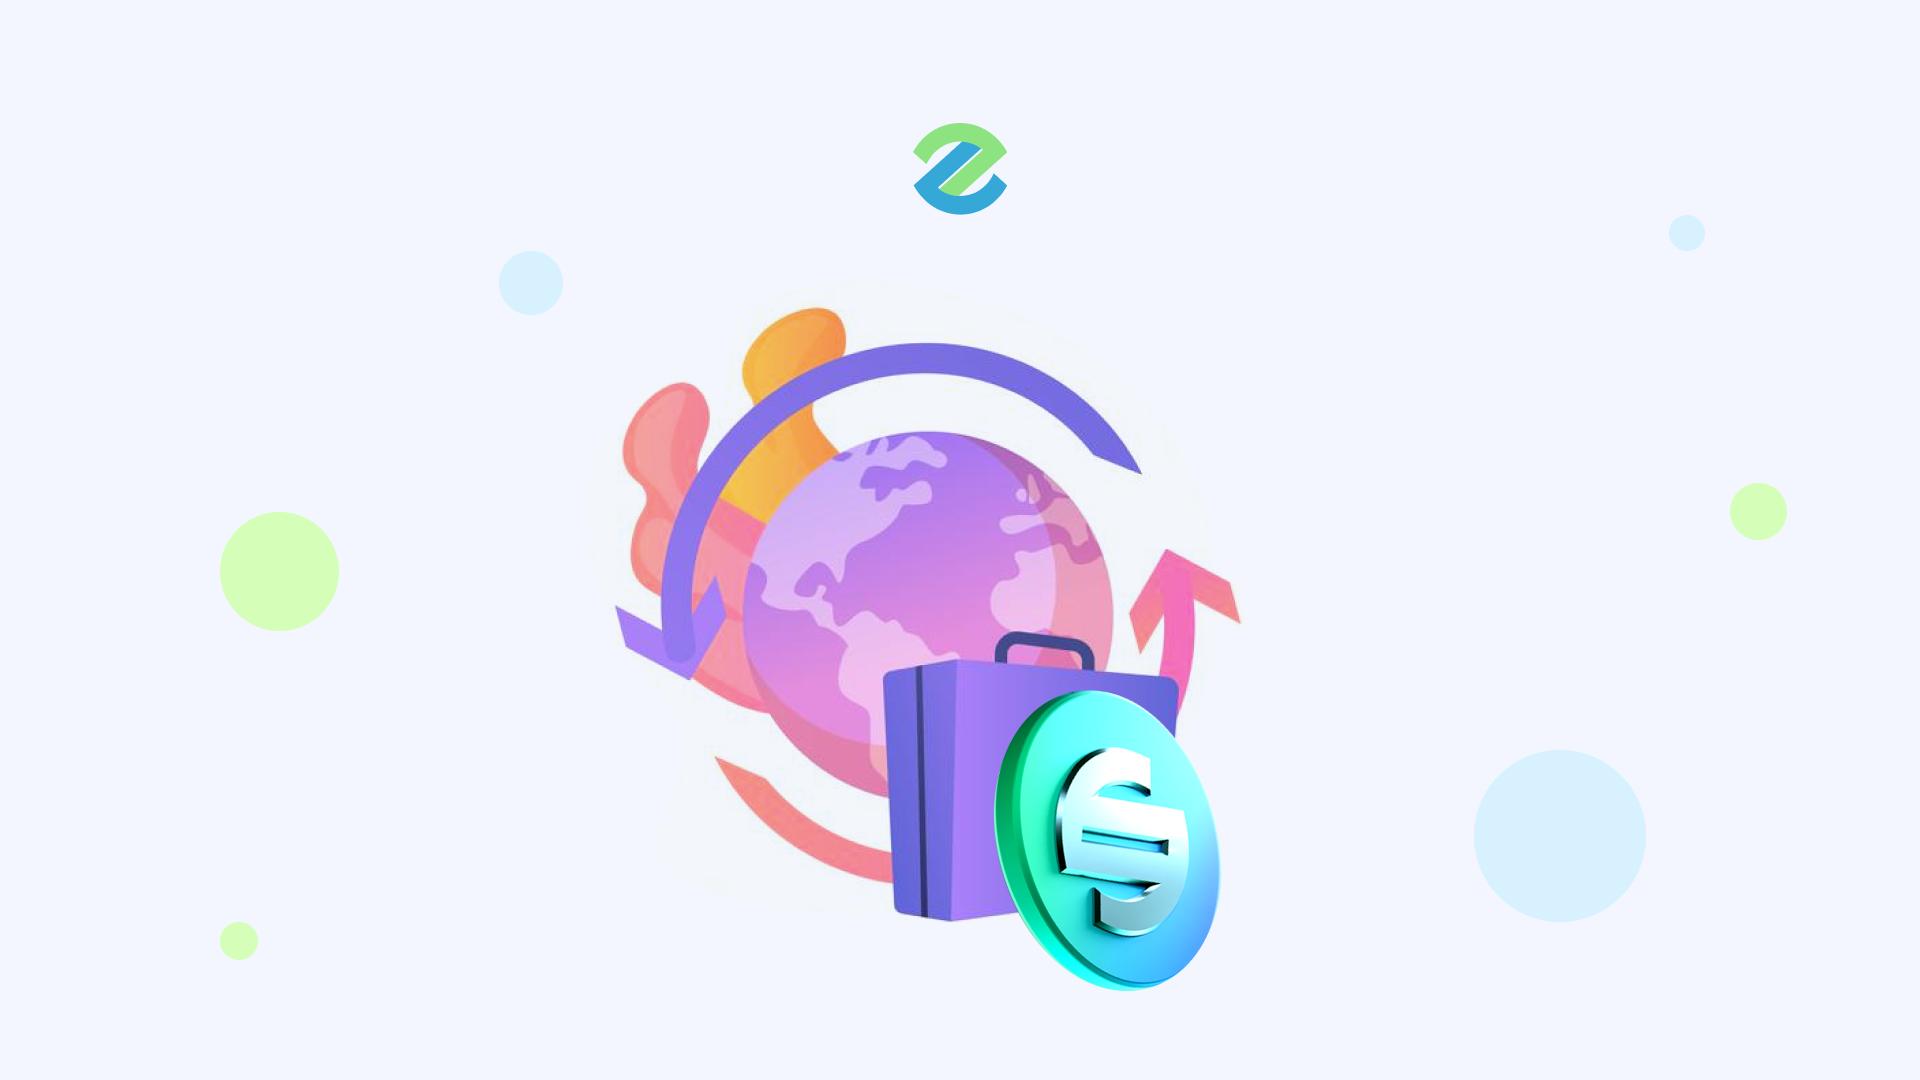 kriptovaljuta zam   novyj investicionnyj instrument2 - Криптовалюта $ZAM – новый инвестиционный инструмент